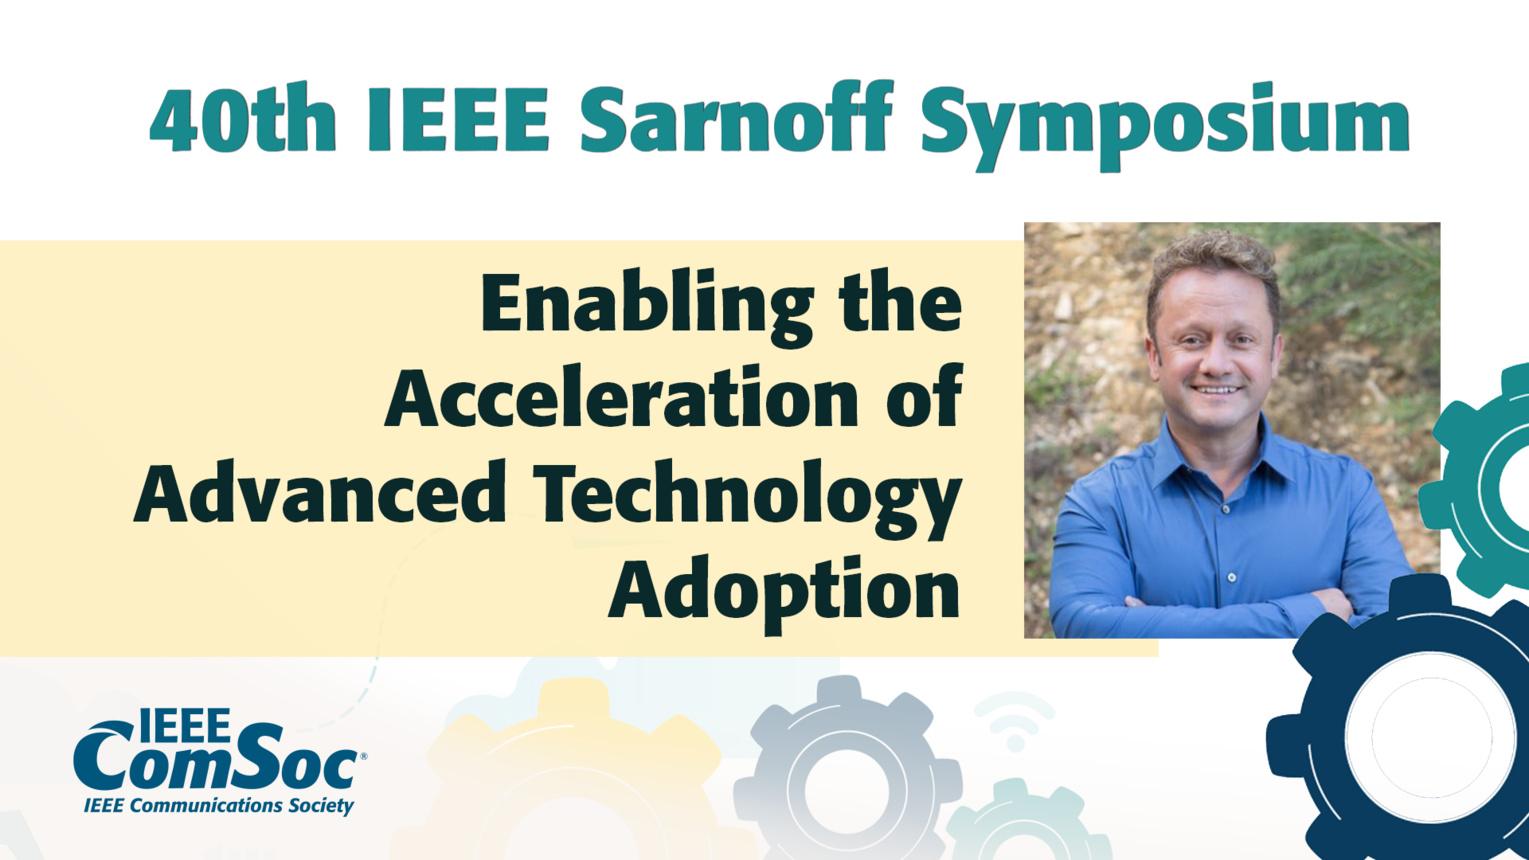 Enabling the Acceleration of Advanced Technology Adoption - Cengiz Alaettinoglu - IEEE Sarnoff Symposium, 2019